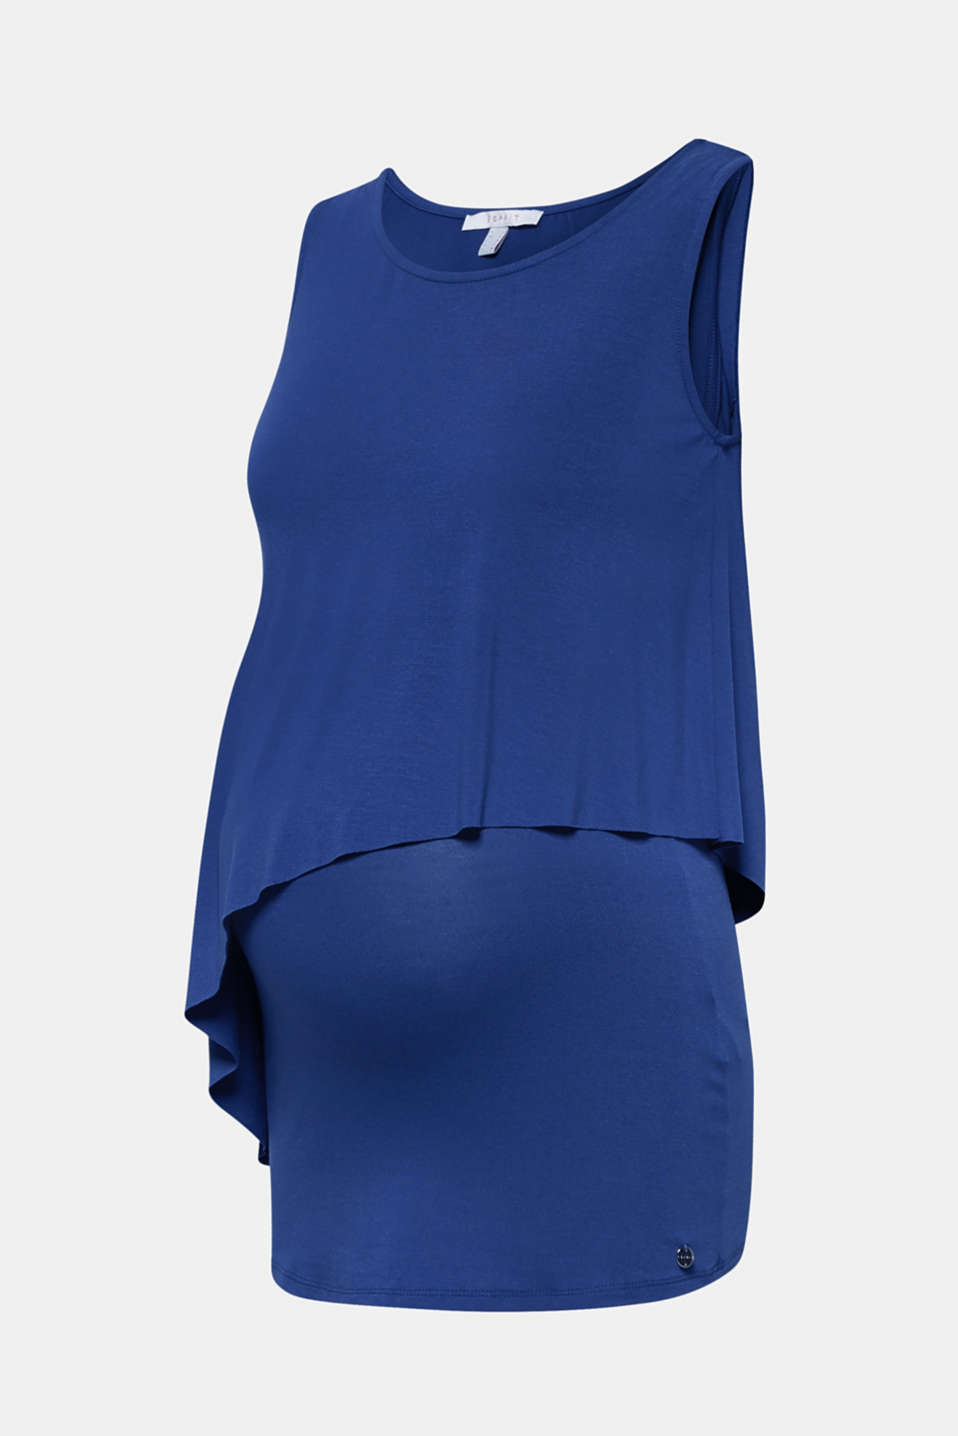 Layered-effect stretch nursing top, LCDARK BLUE, detail image number 7